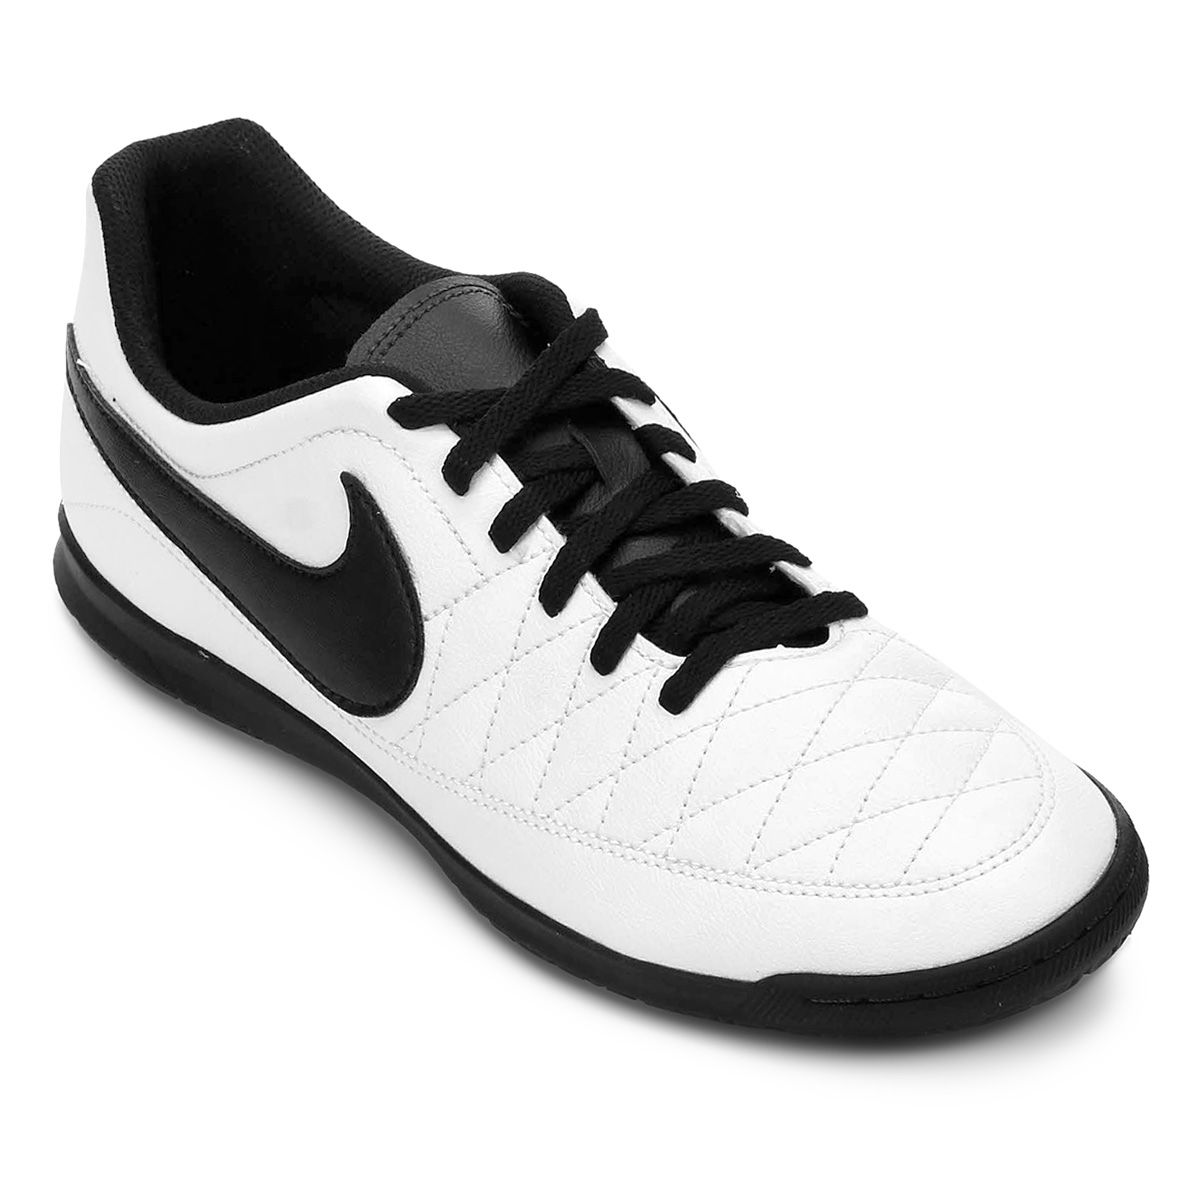 482eb23f23b10 Chuteira Futsal Nike Majestry Ic - BRACIA SHOP: Loja de Roupas ...